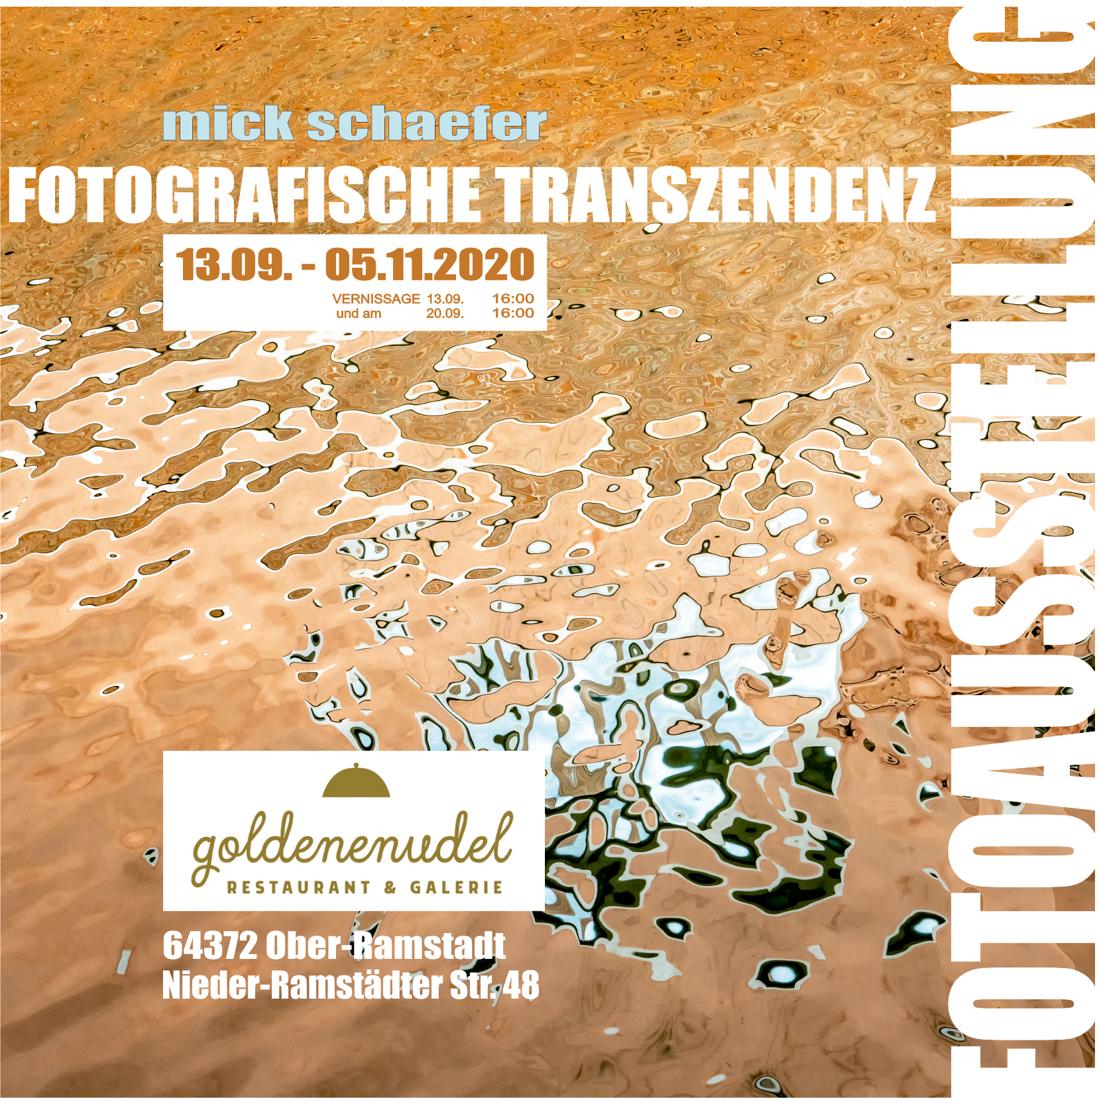 Goldene Nudel Ober-Ramstadt 2020